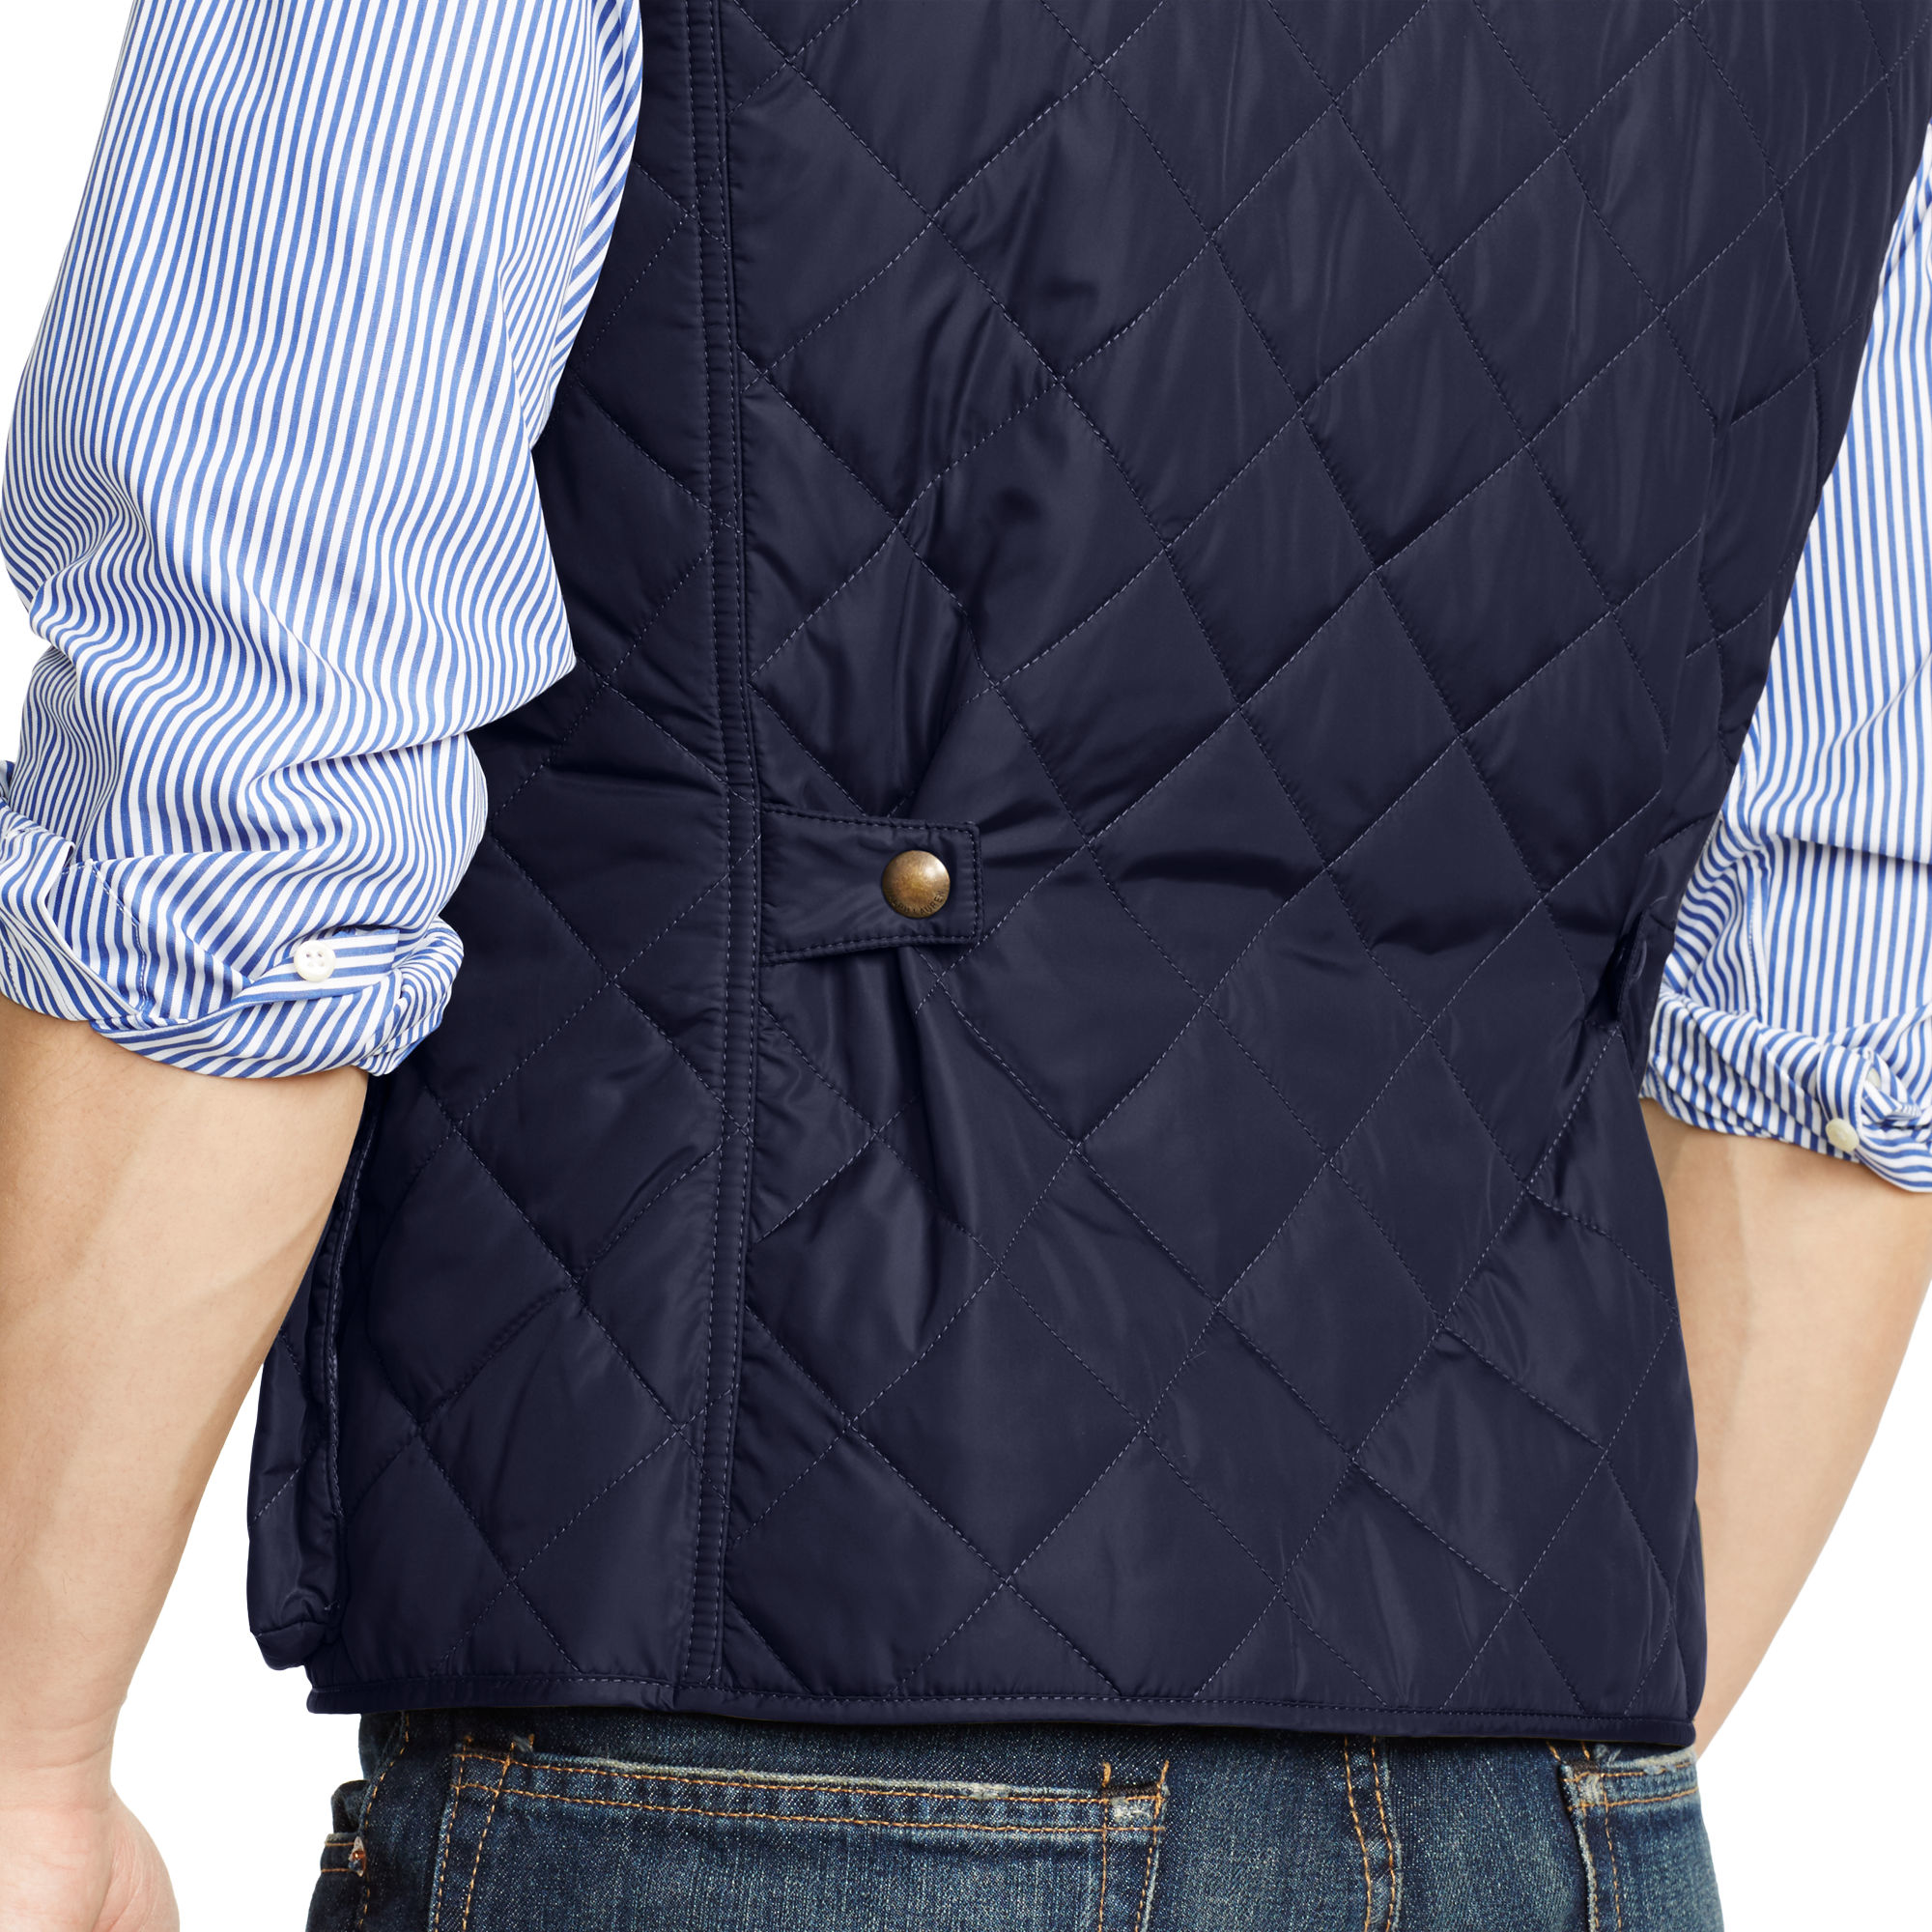 quilted black jacket quilt style mens lauren ralph adidas threads us originals pin superstar